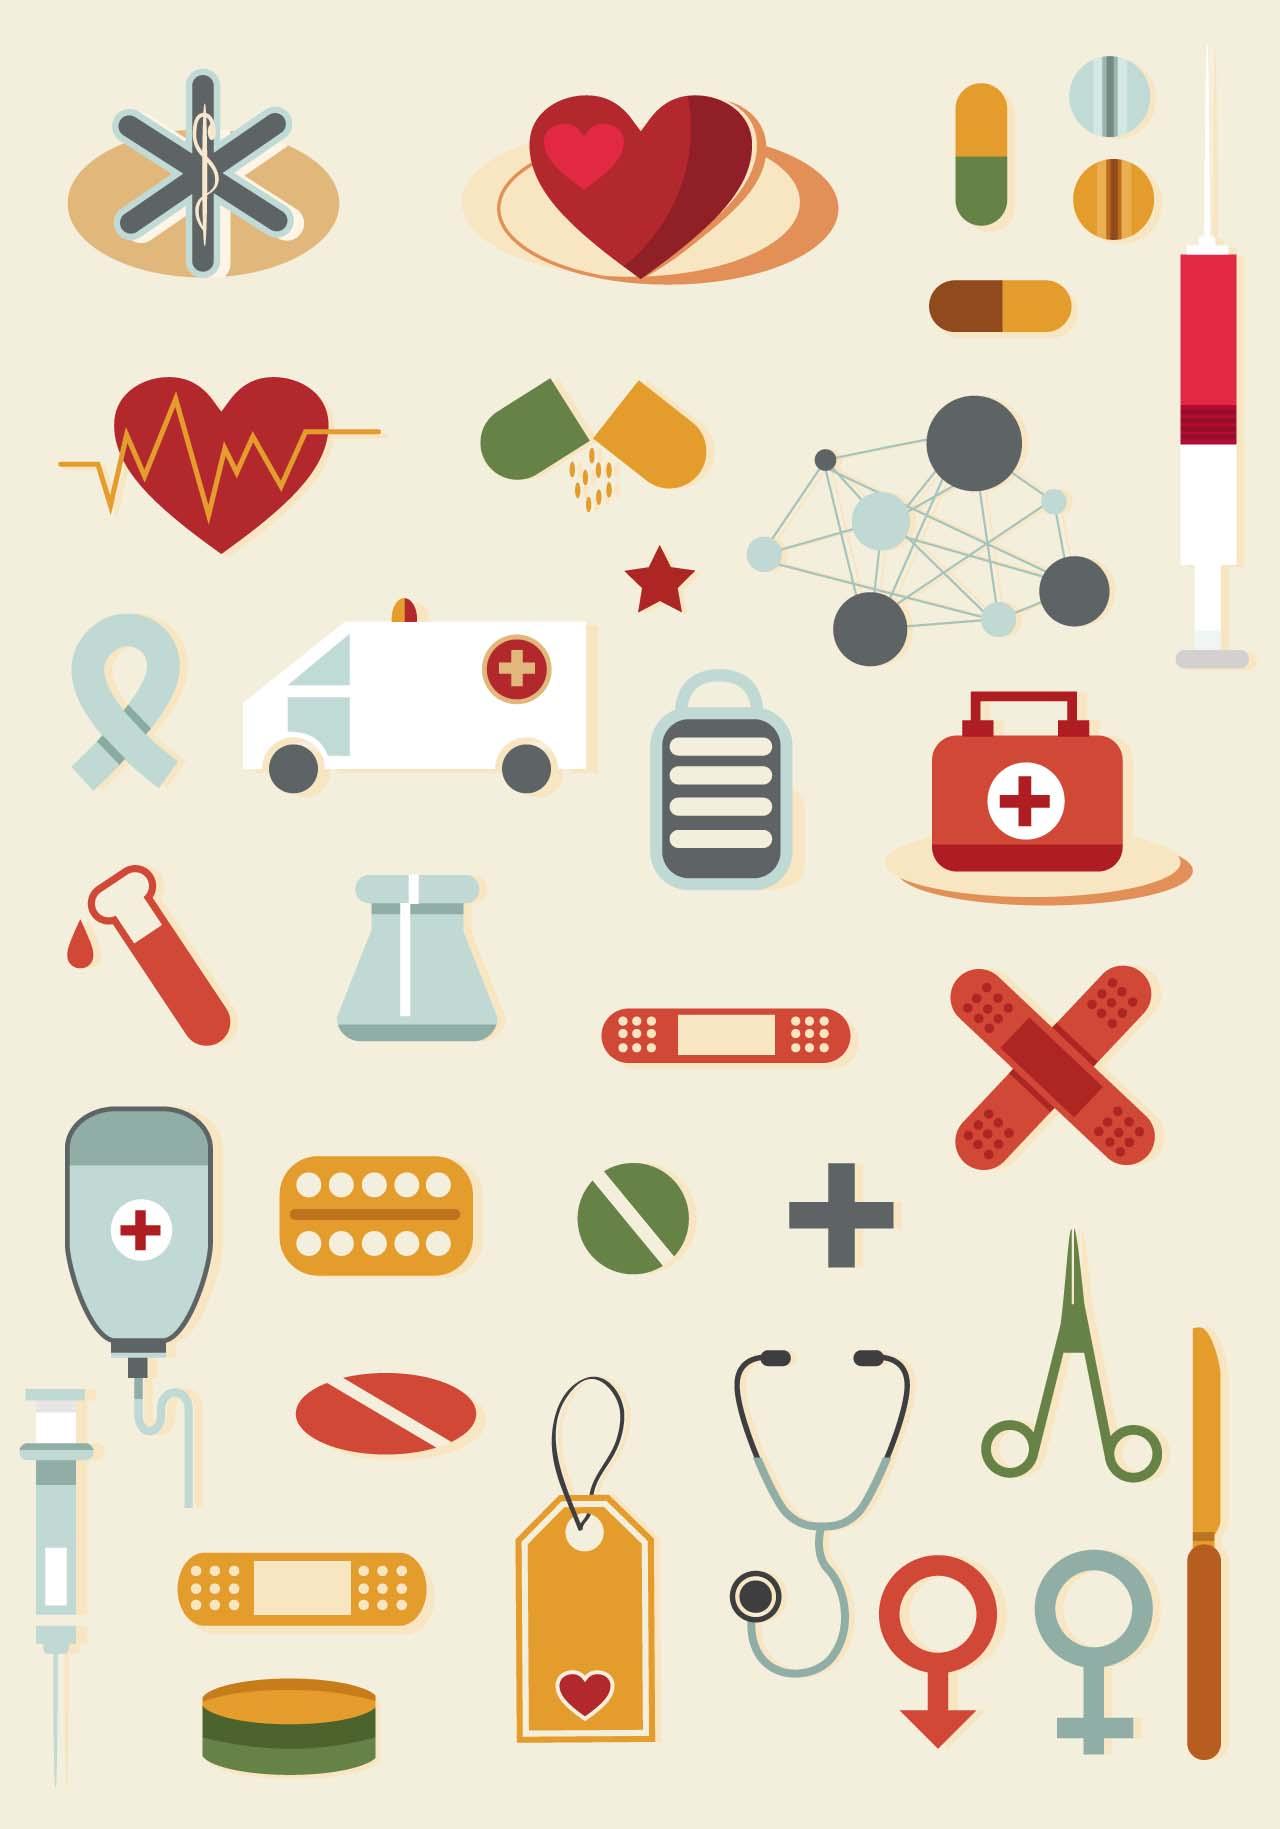 Medical cartoon clipart graphic transparent stock Free Cartoon Medicine Cliparts, Download Free Clip Art, Free Clip ... graphic transparent stock